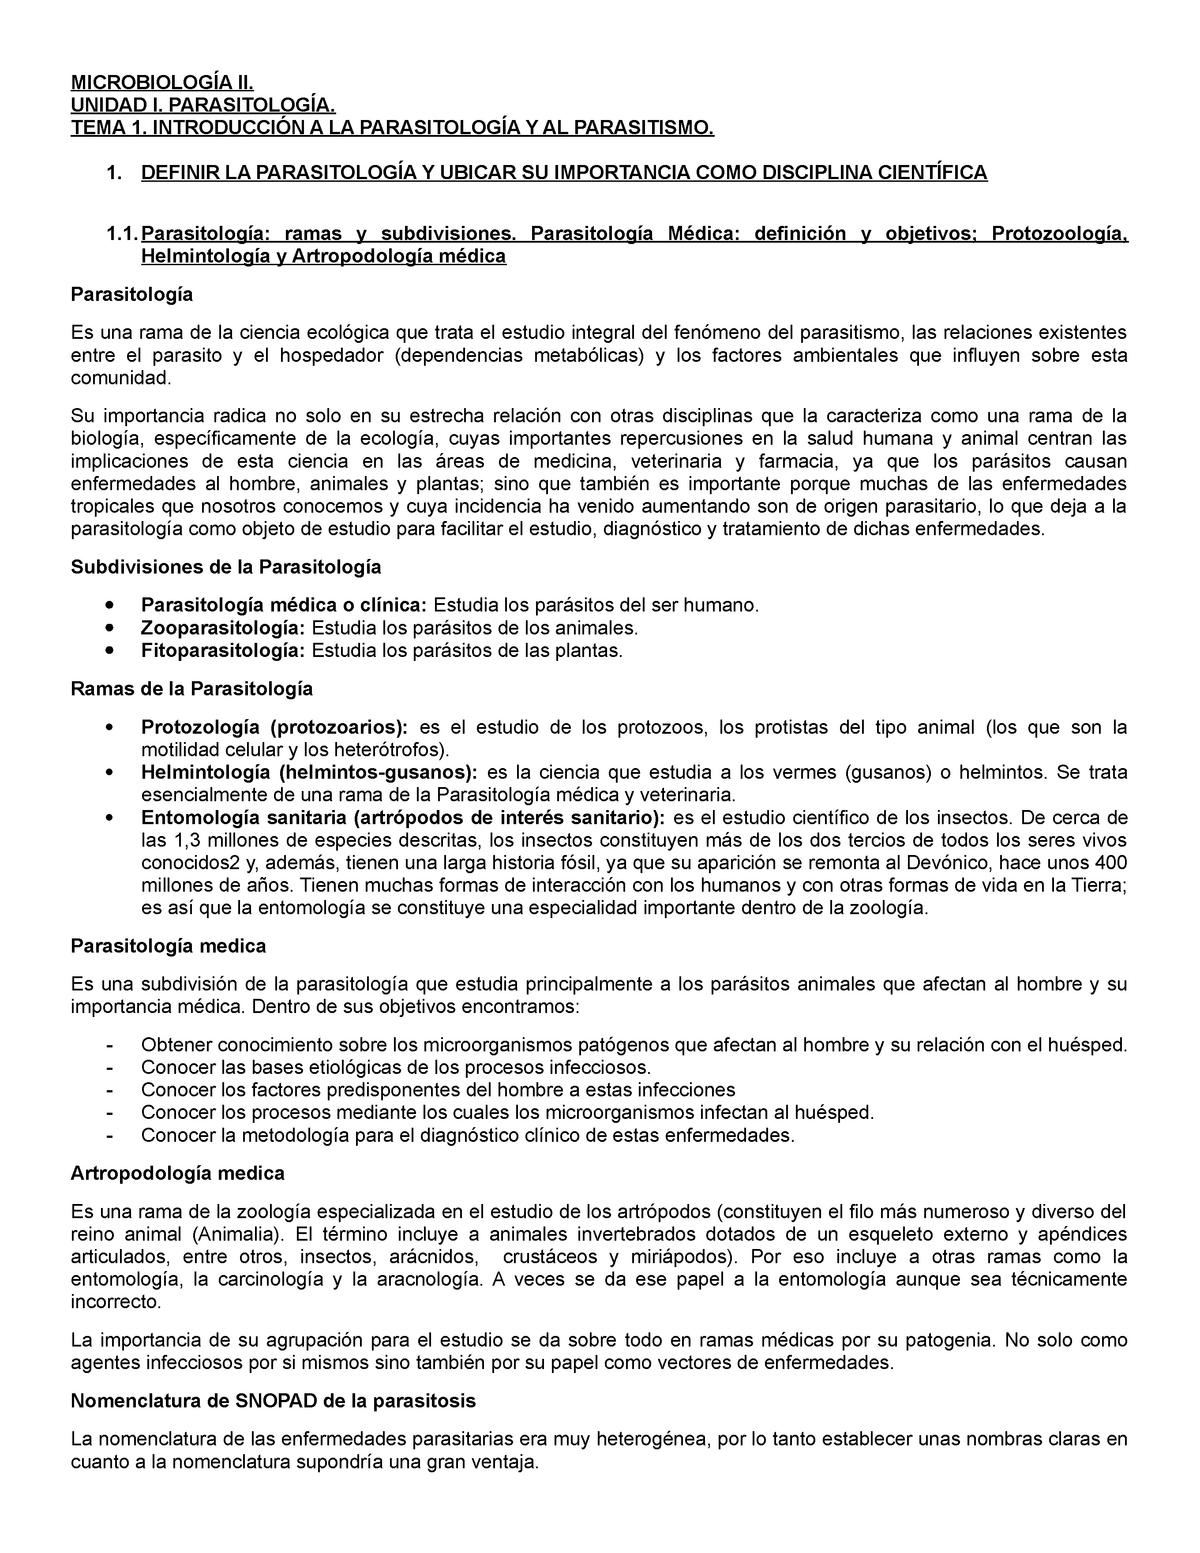 Klinikai bakteriológiai és parazitológiai vizsgálatok